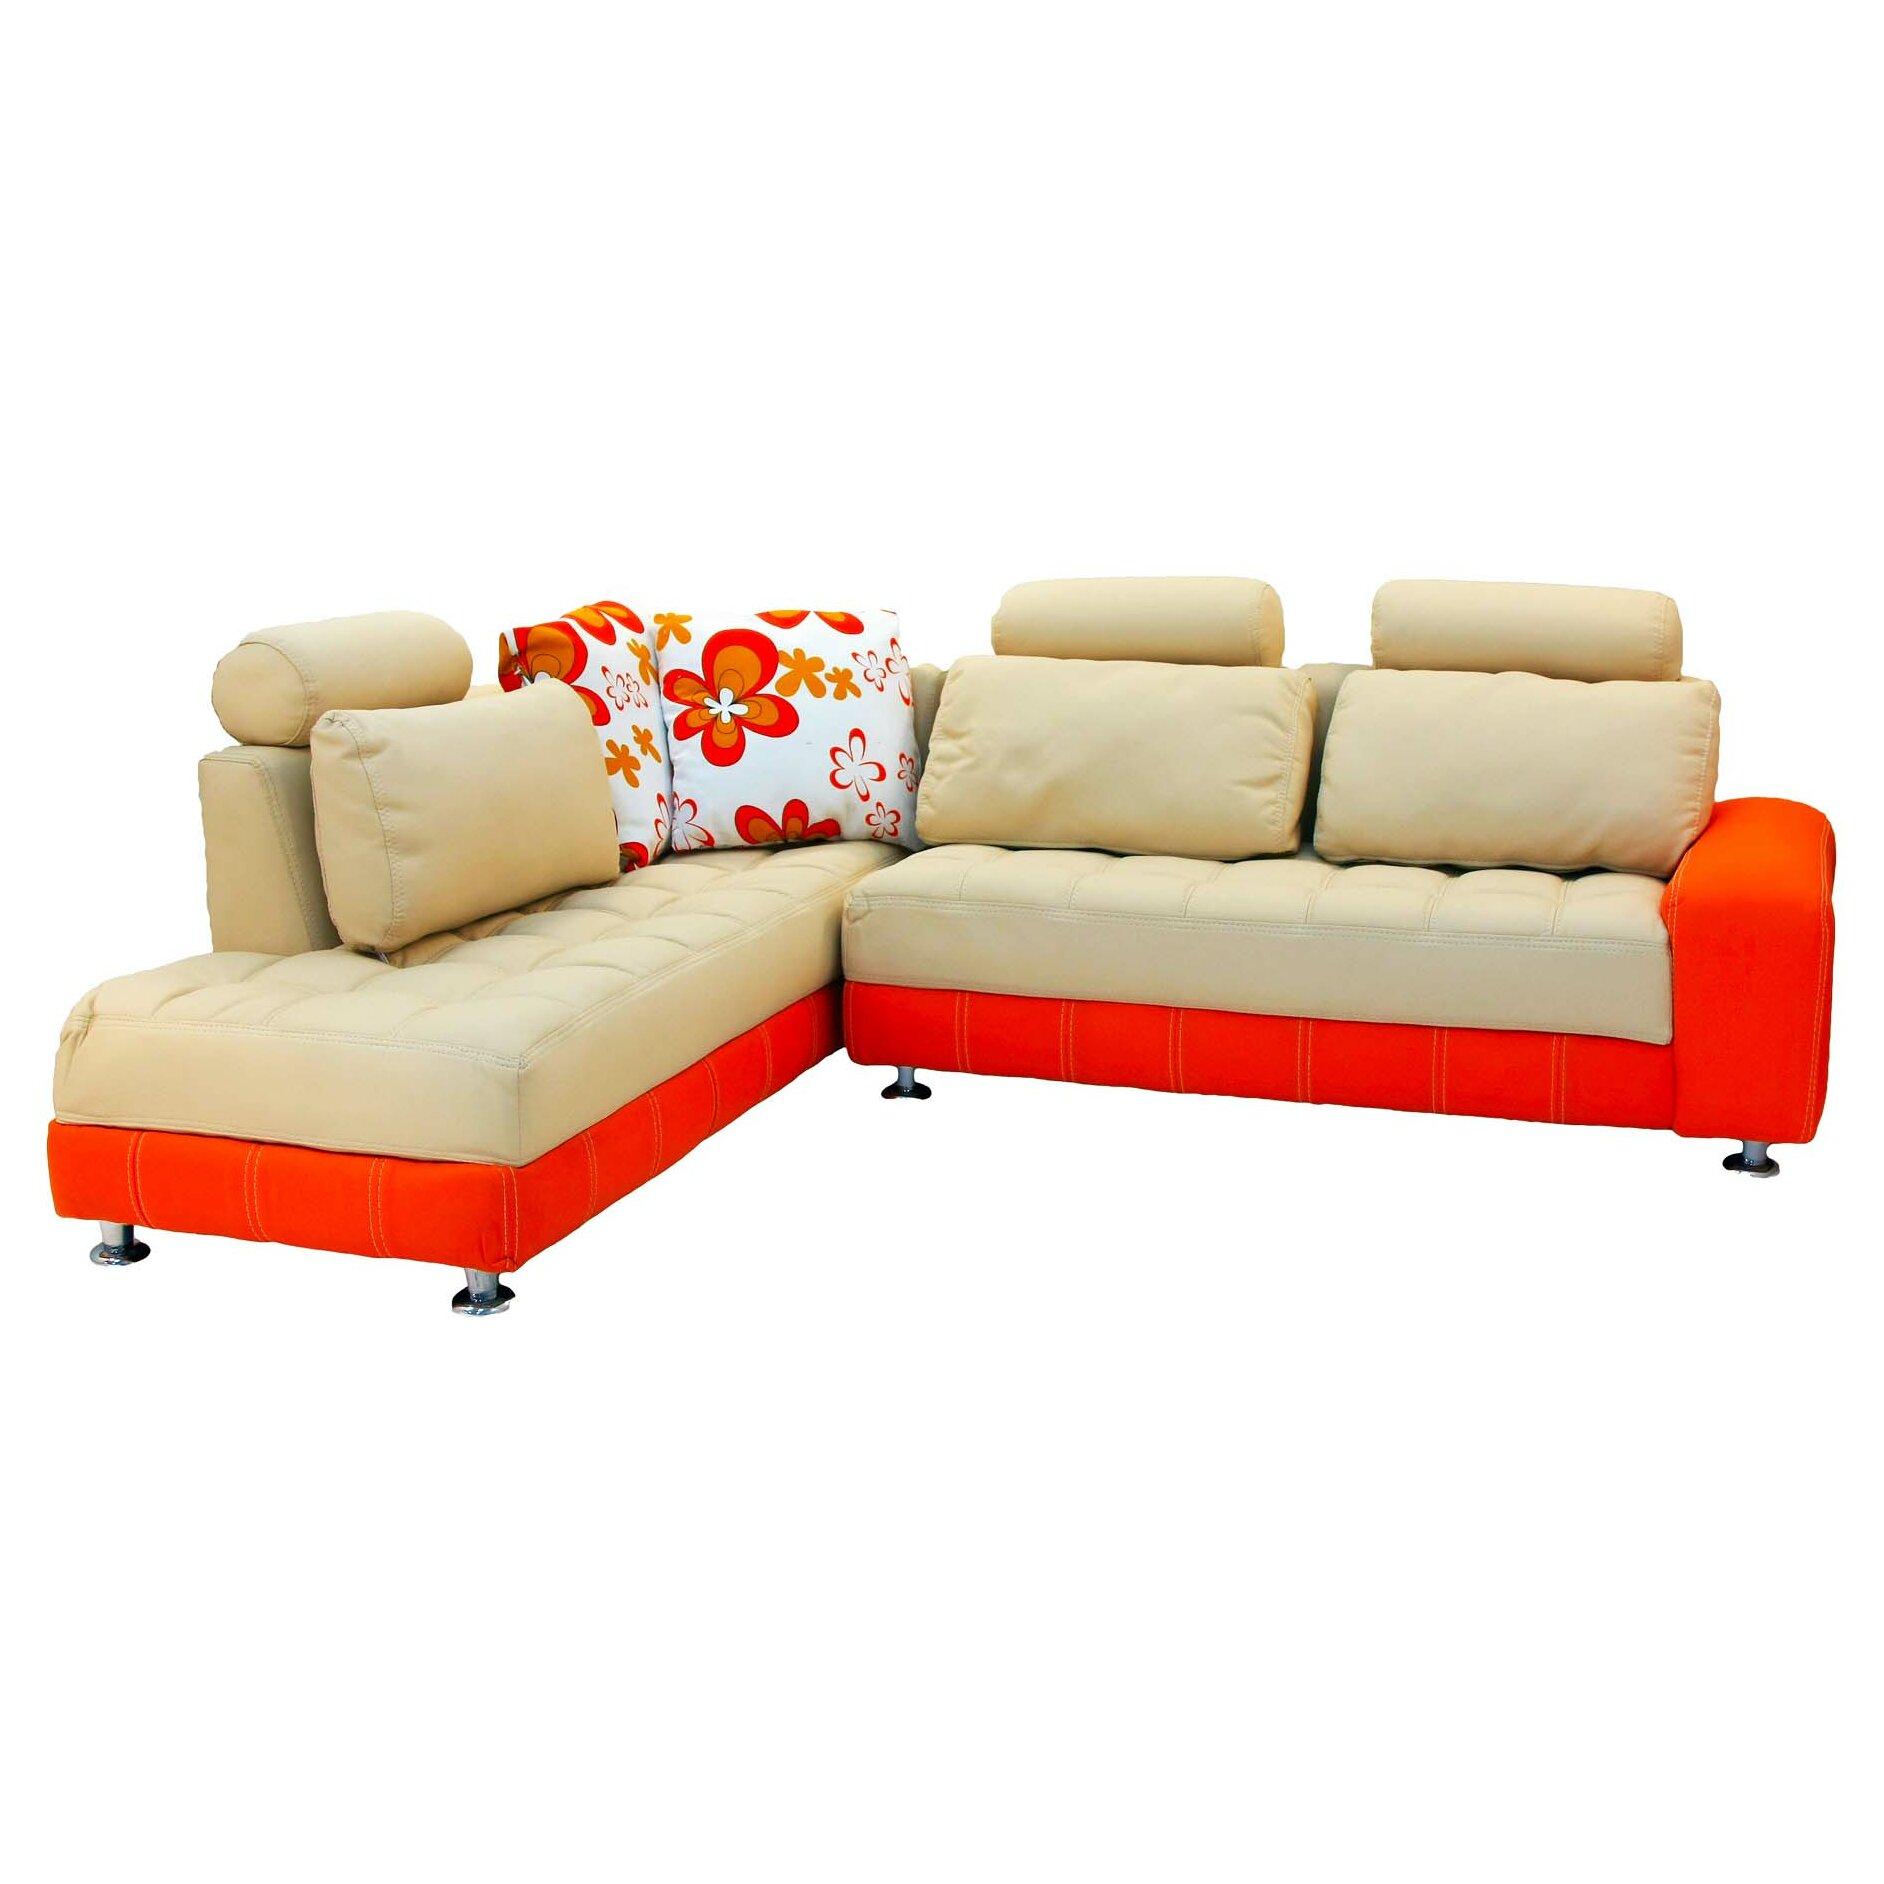 Kids Living Room Set A Child Supply Jessica 2 Piece Kids Sofa Set Reviews Wayfair